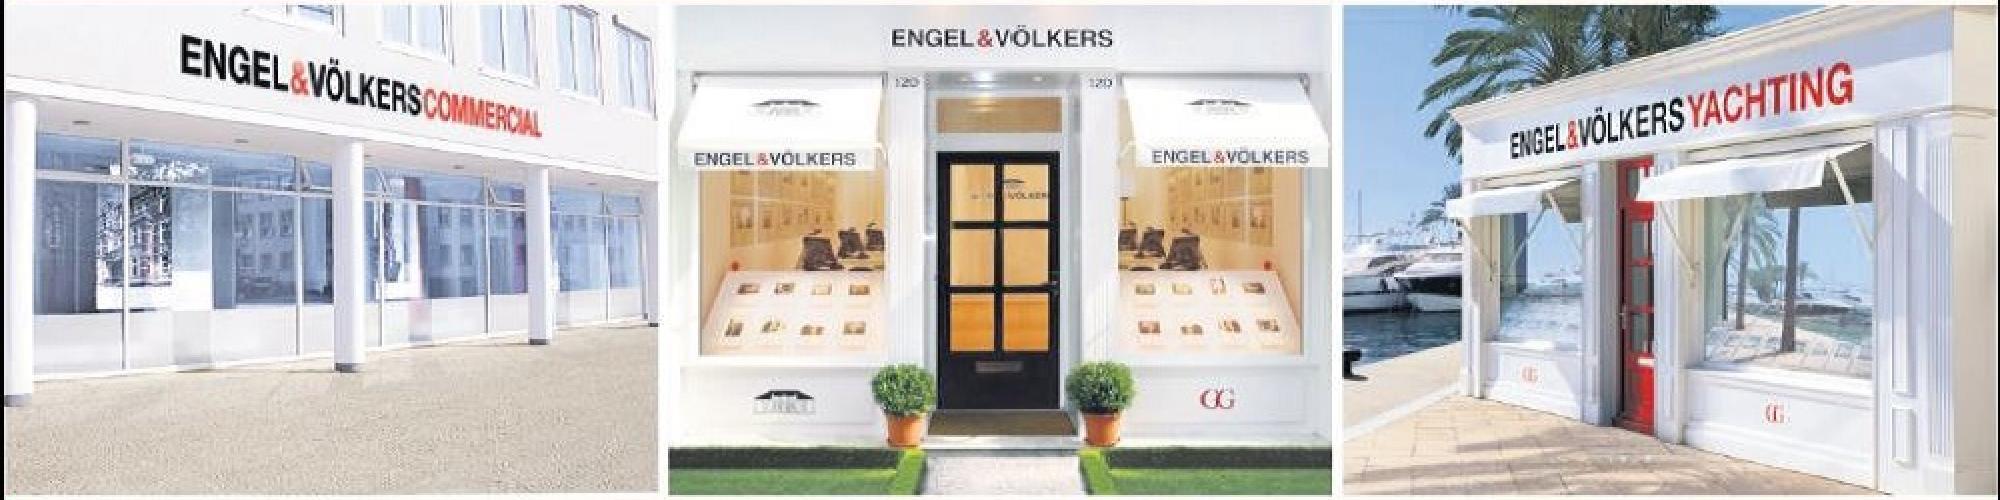 EuV Potsdam Immobilien GmbH